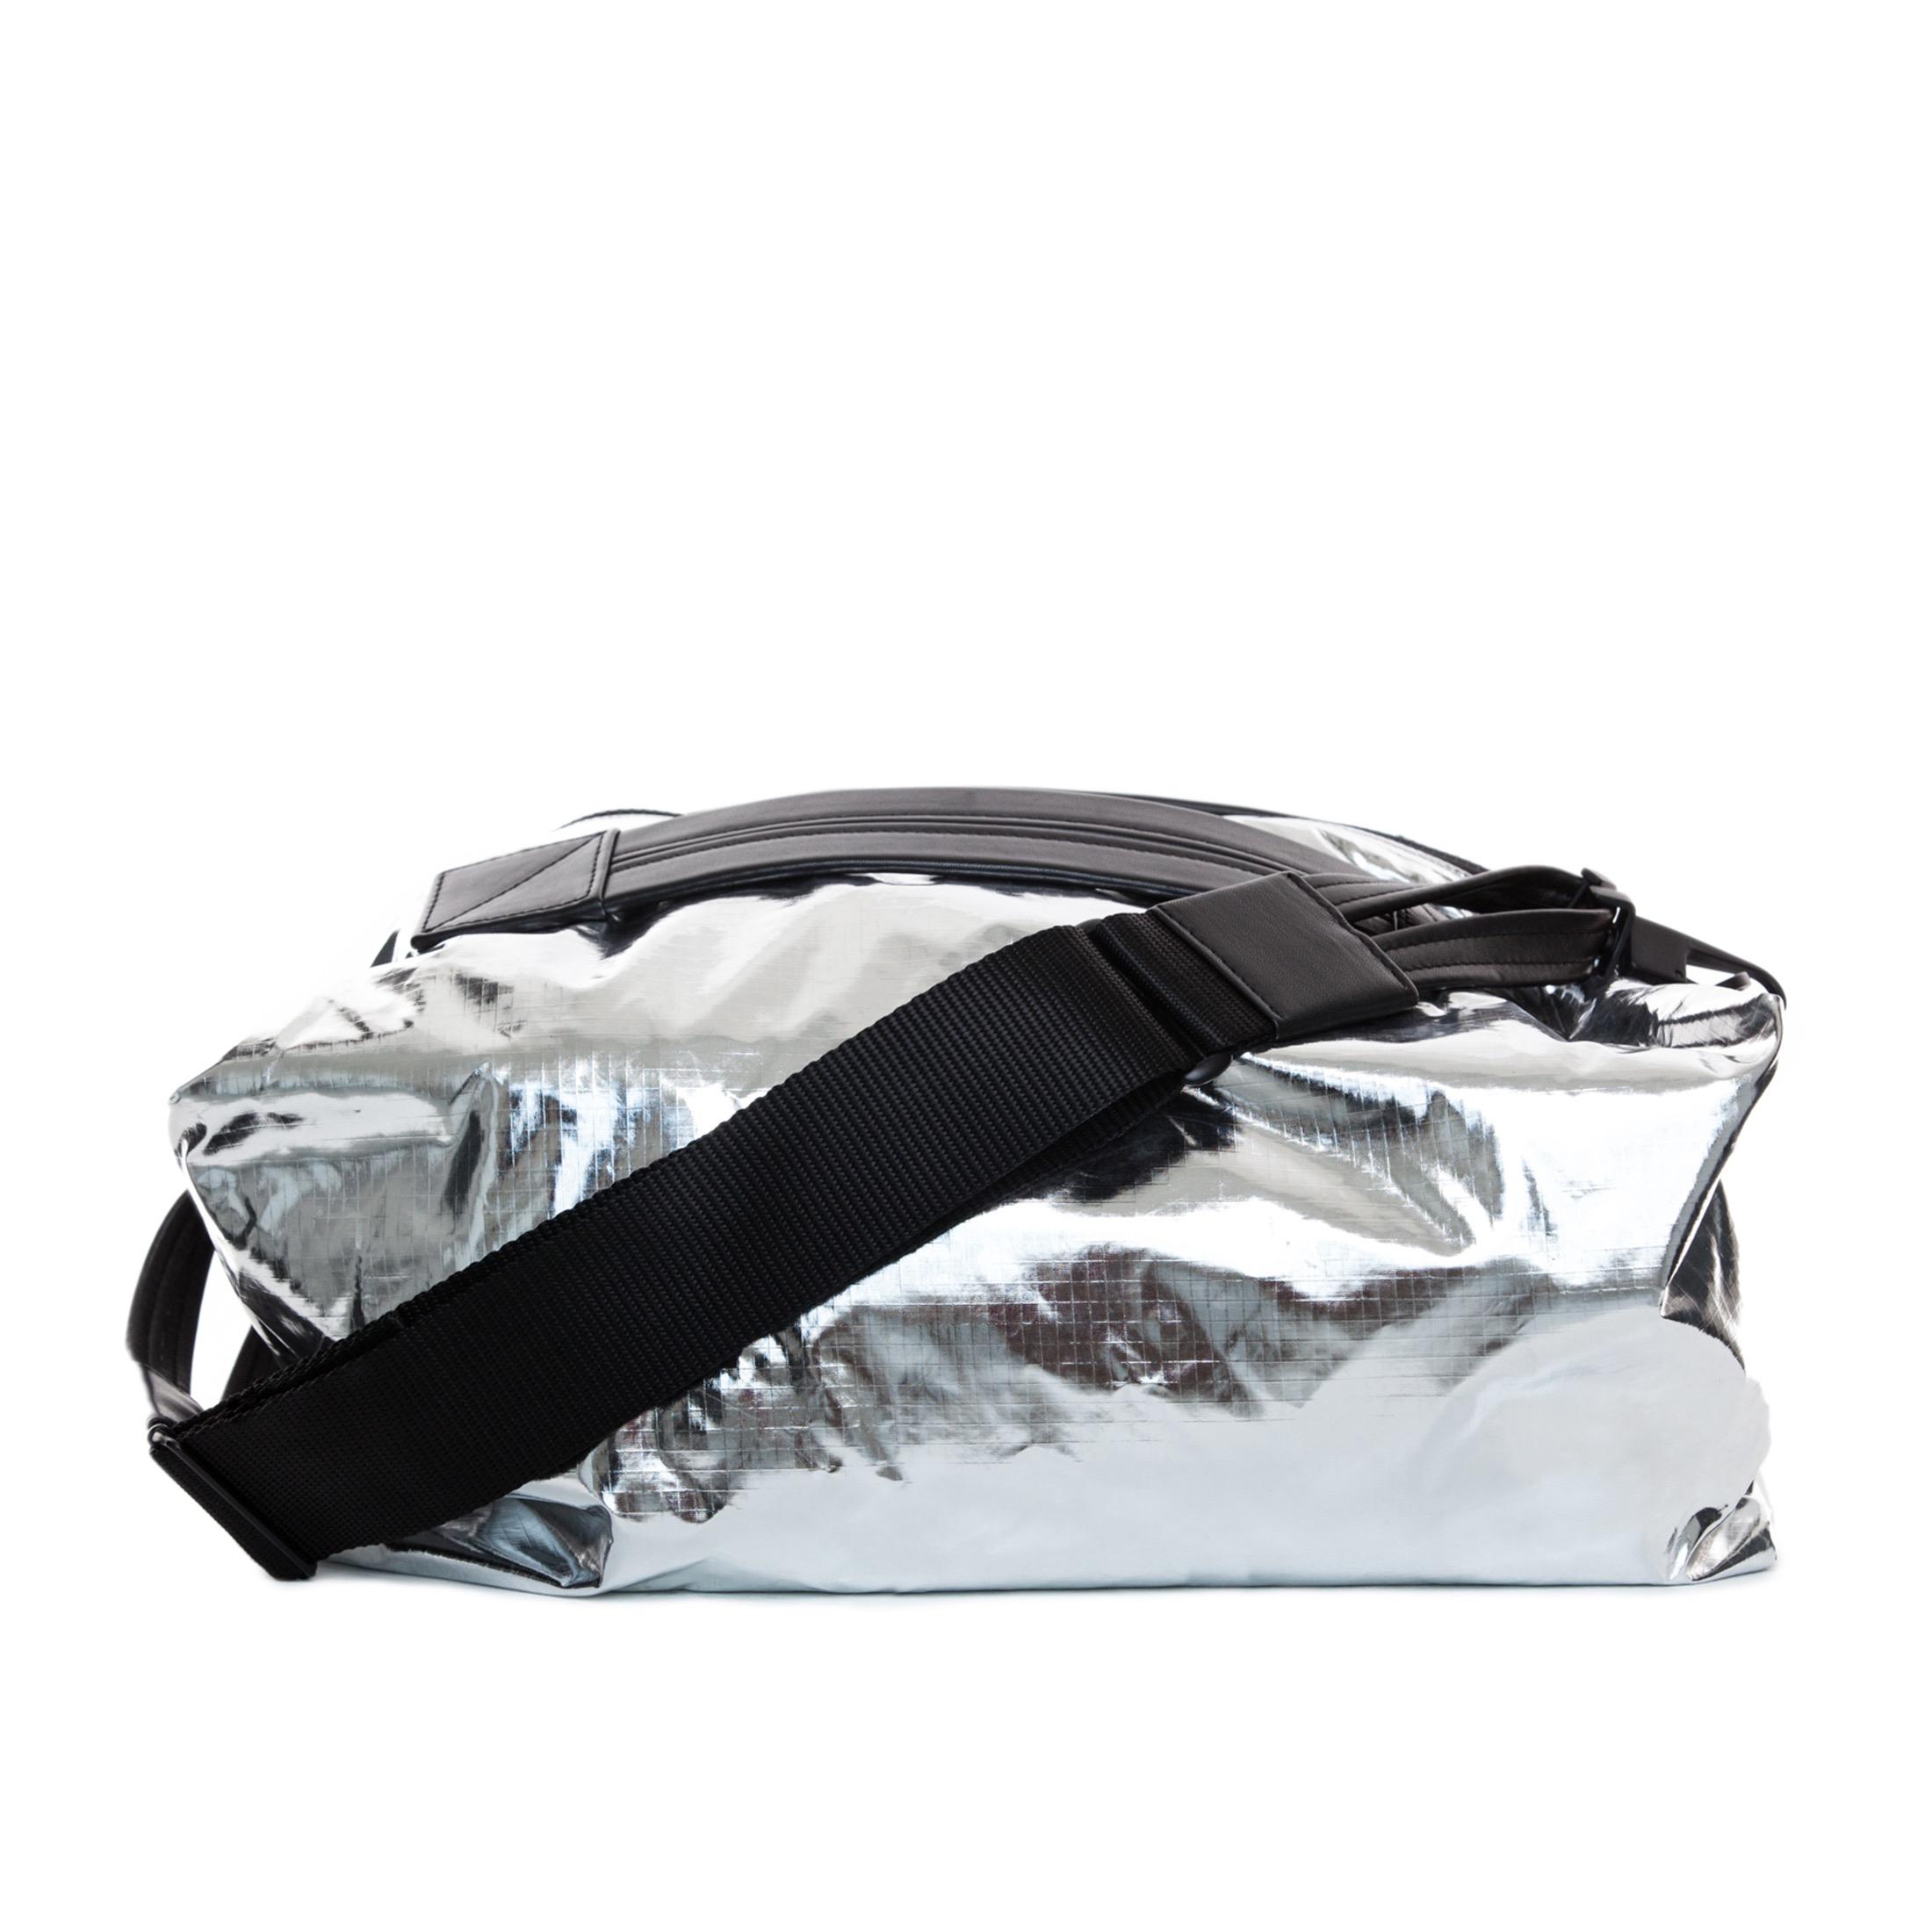 Lyst - The Transience Metallic Rip Stop Gym Bag in Metallic 935ff57f71e33